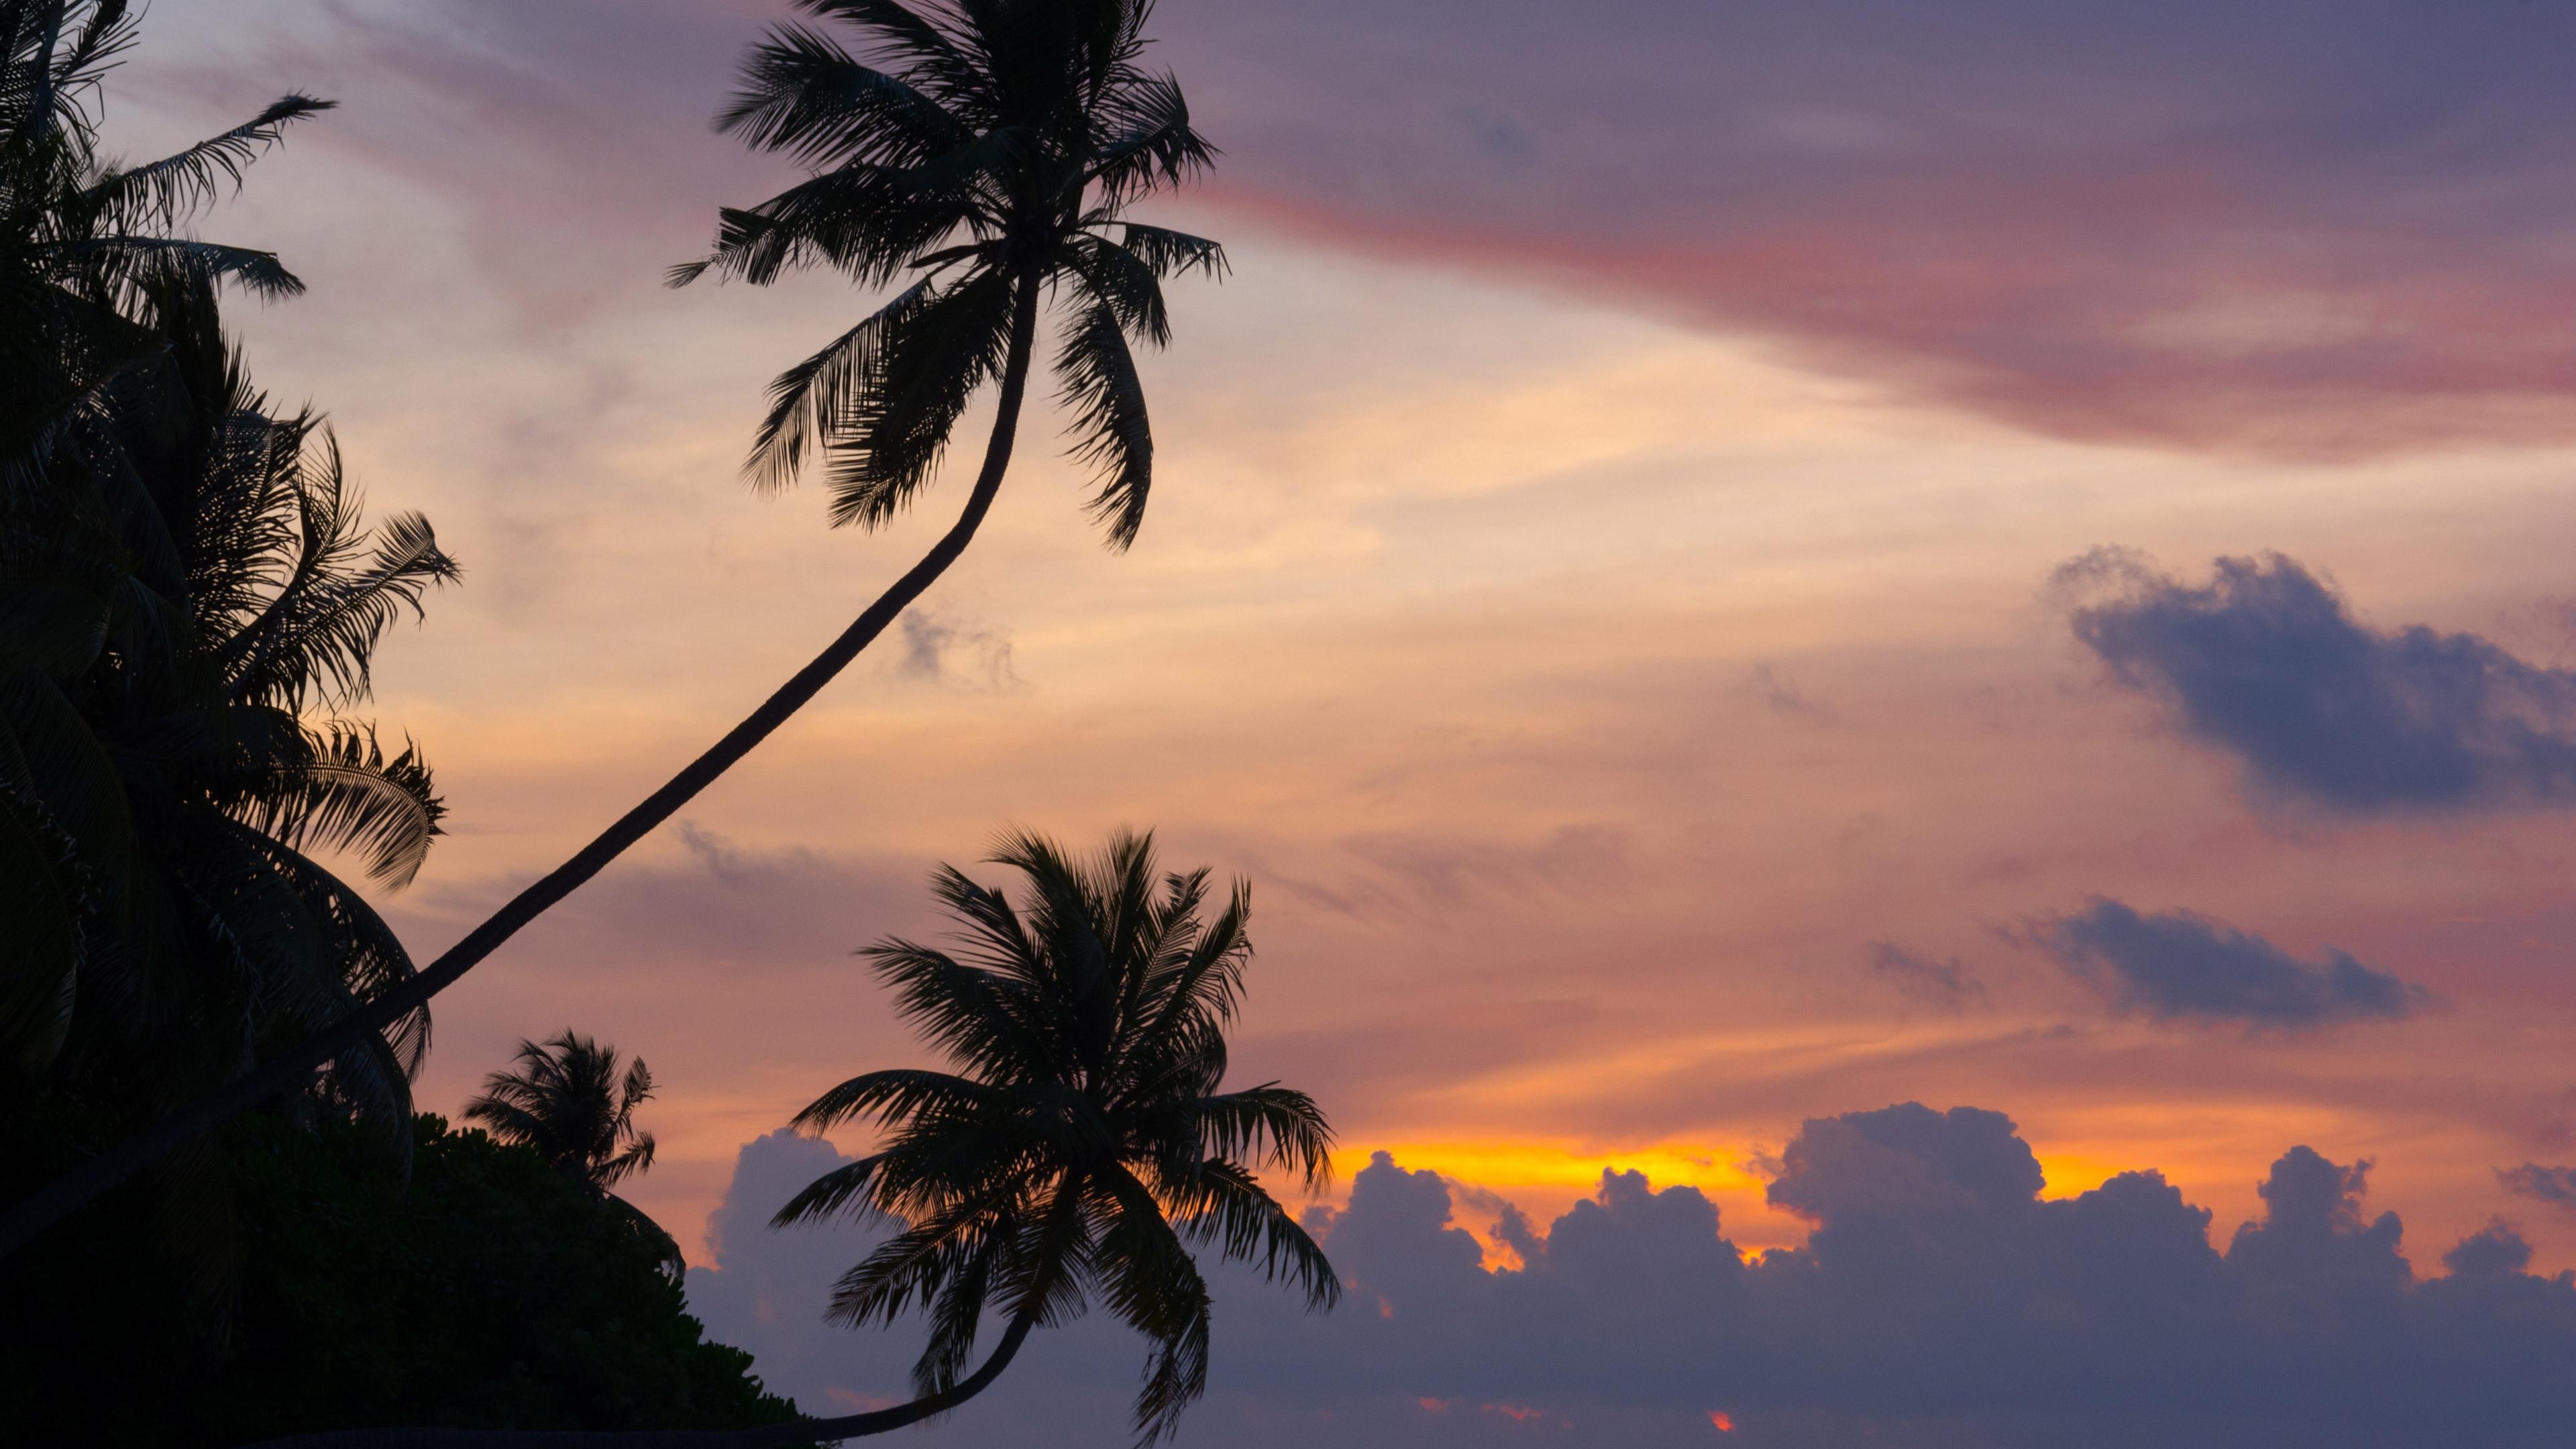 Maldivian Sunset 4K Wallpaper